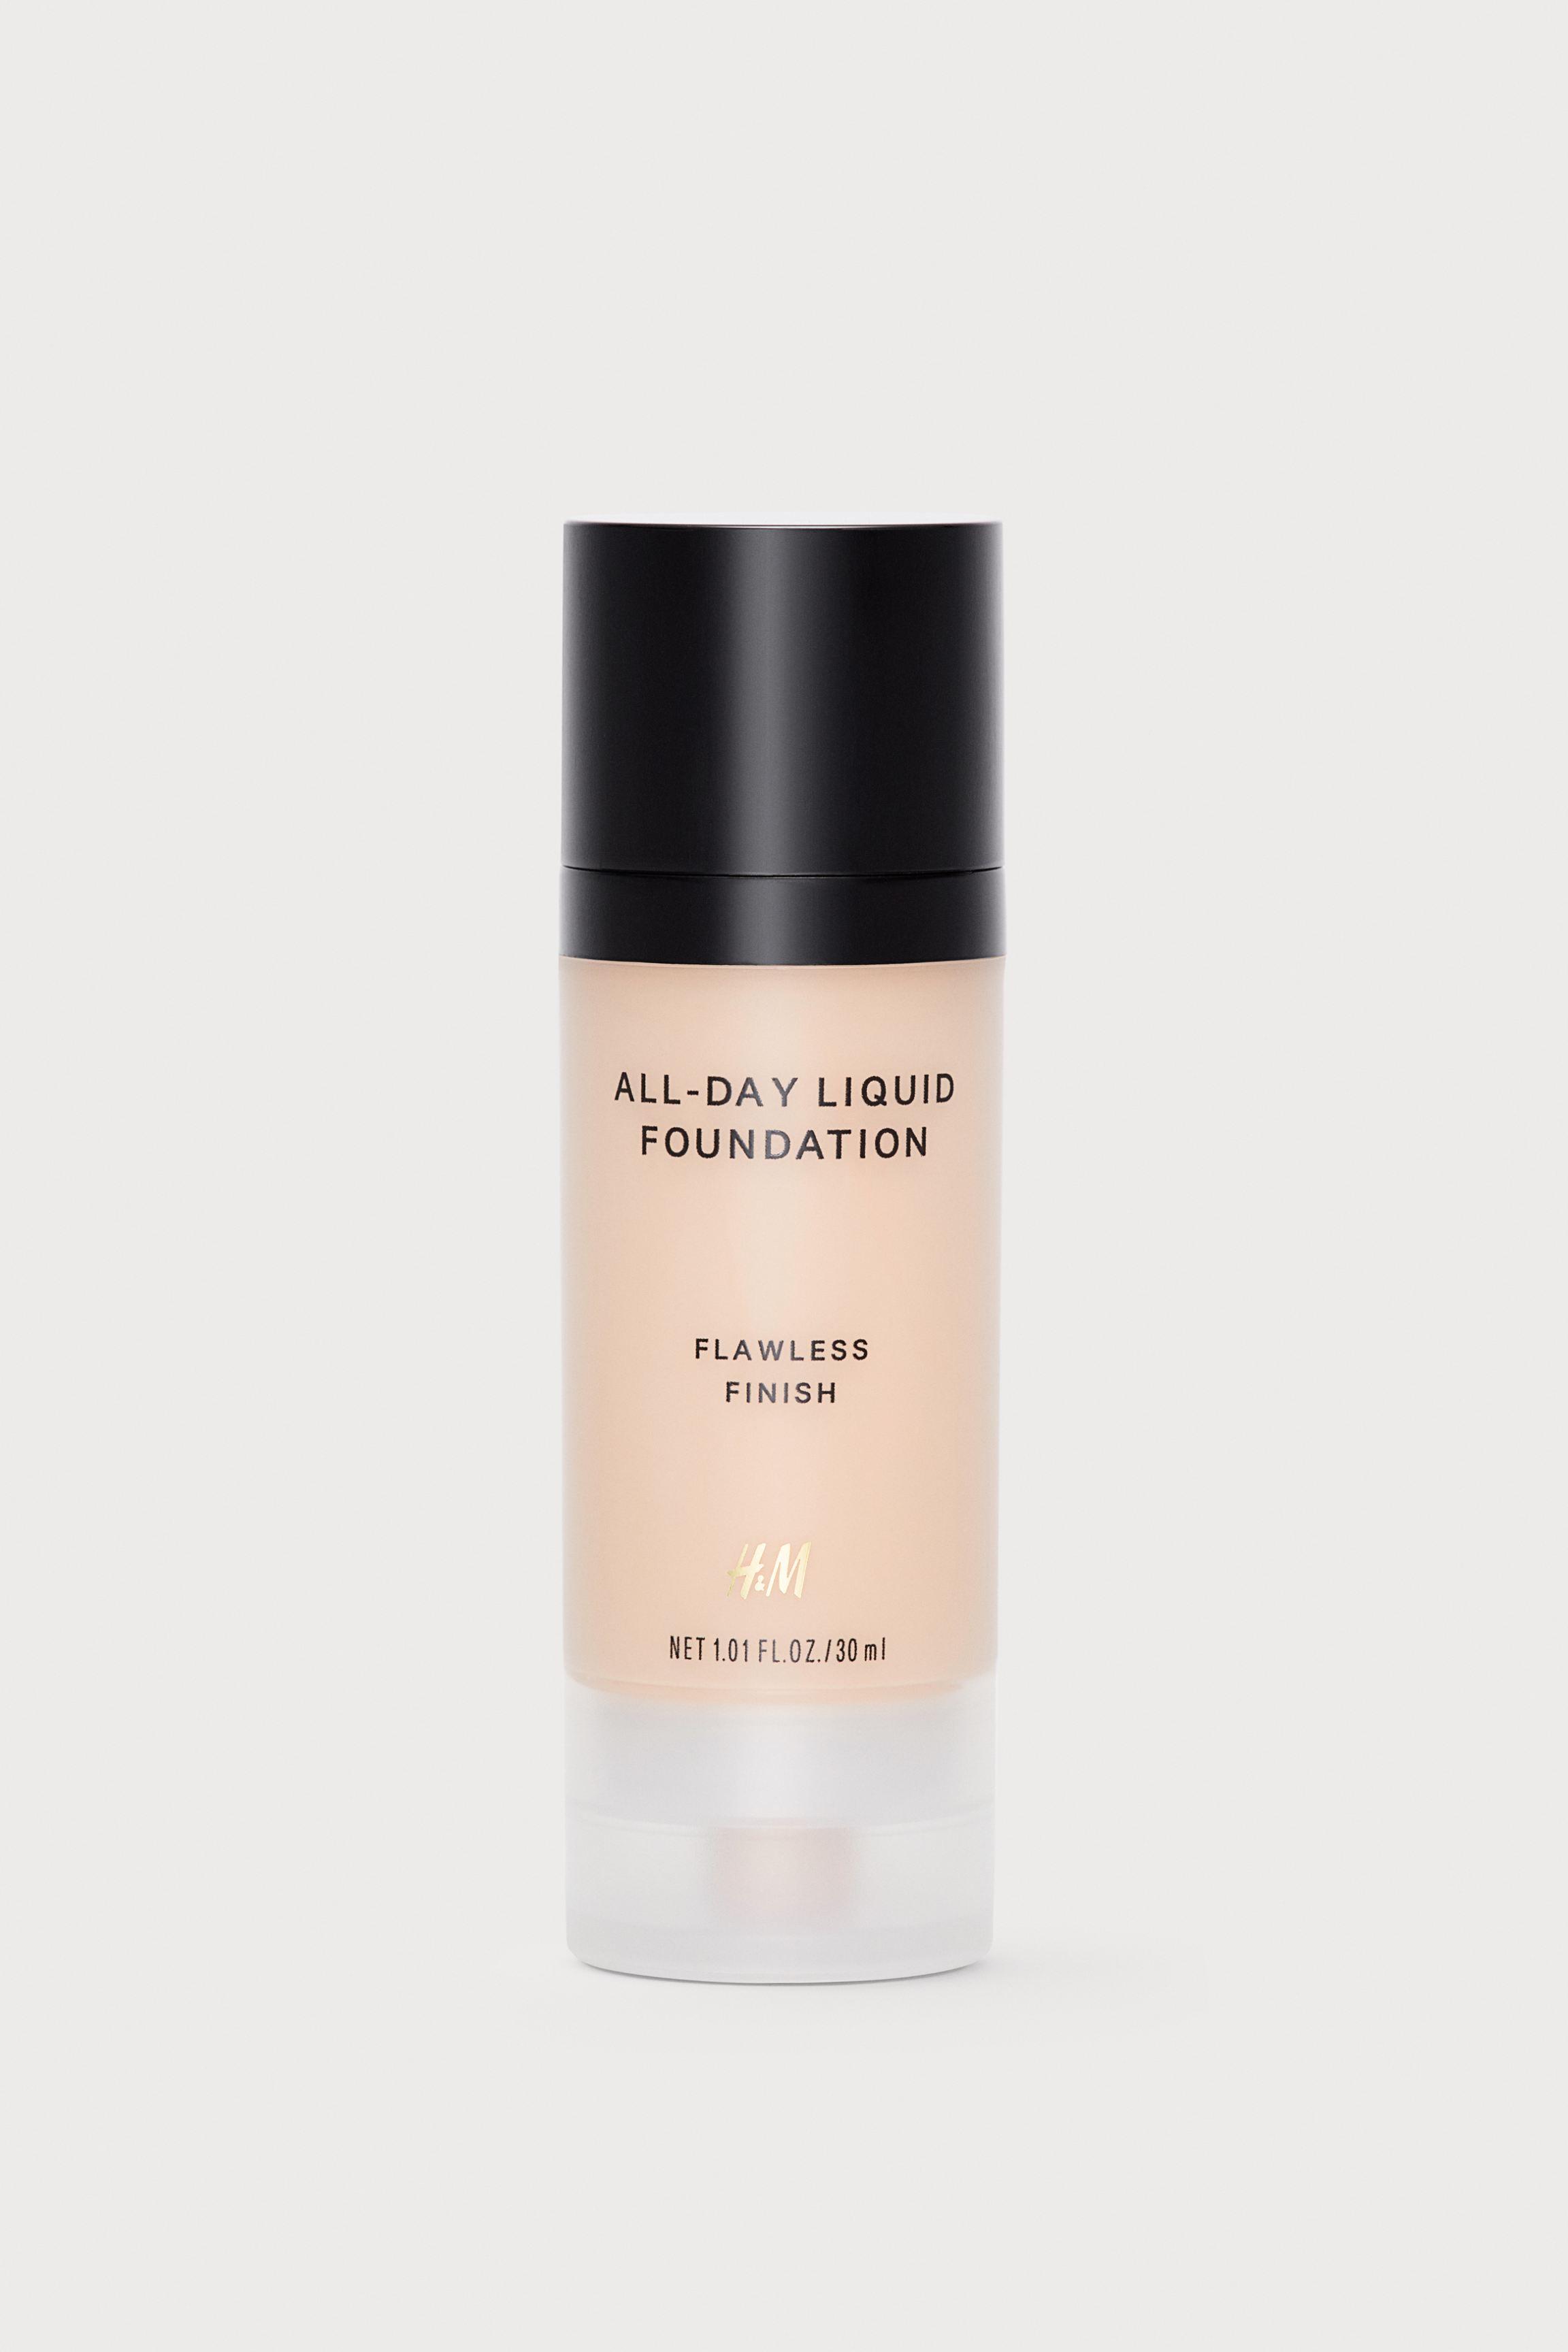 All-day Liquid Foundation